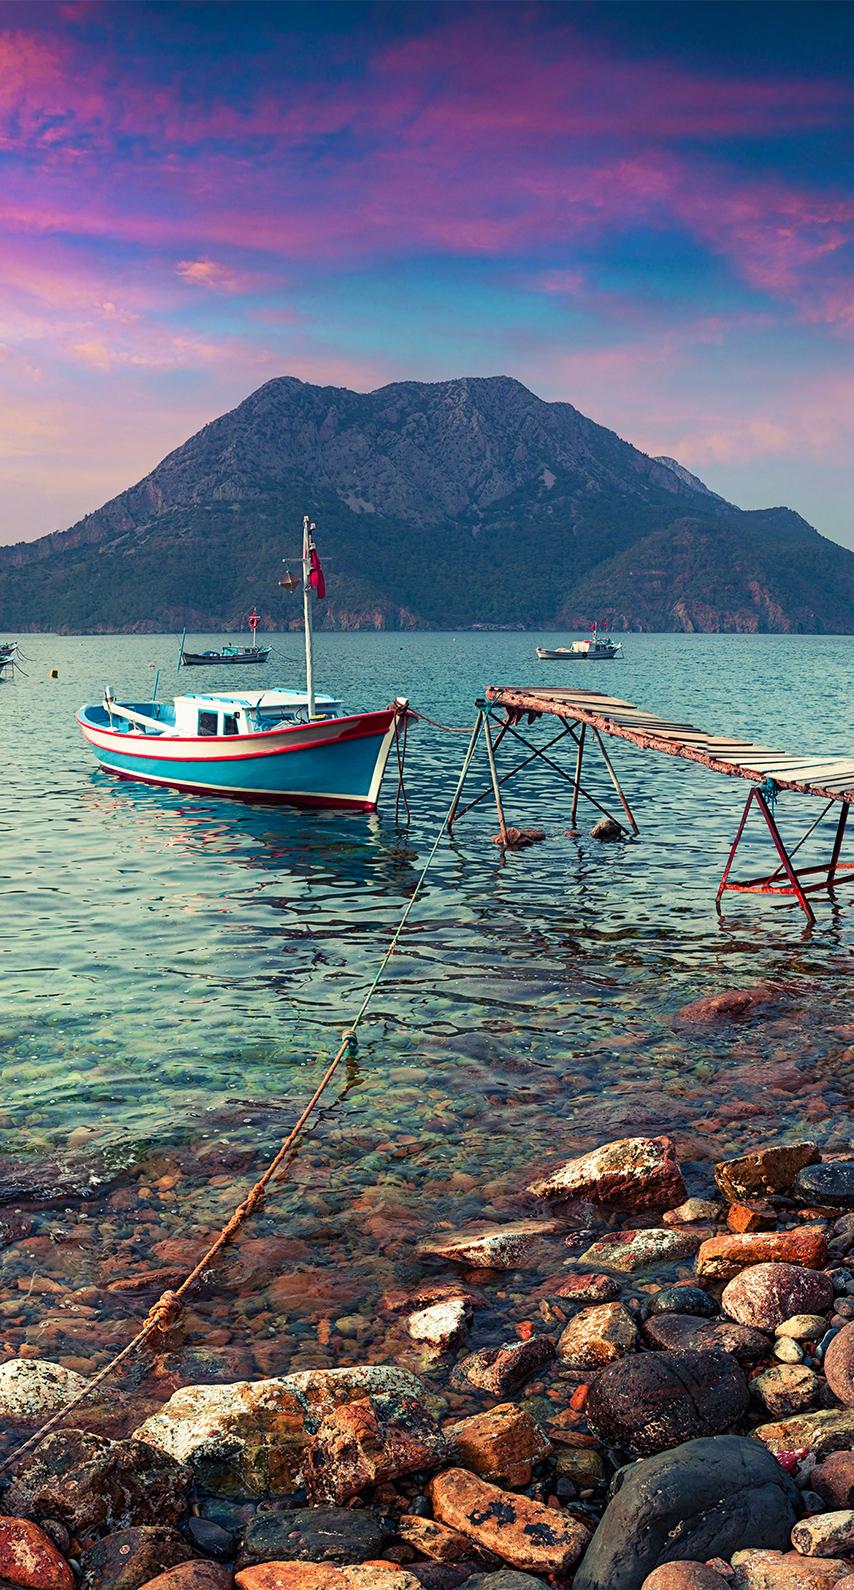 boat, sun, no person, transportation system, recreation, leisure, relaxation, seascape, seashore, watercraft